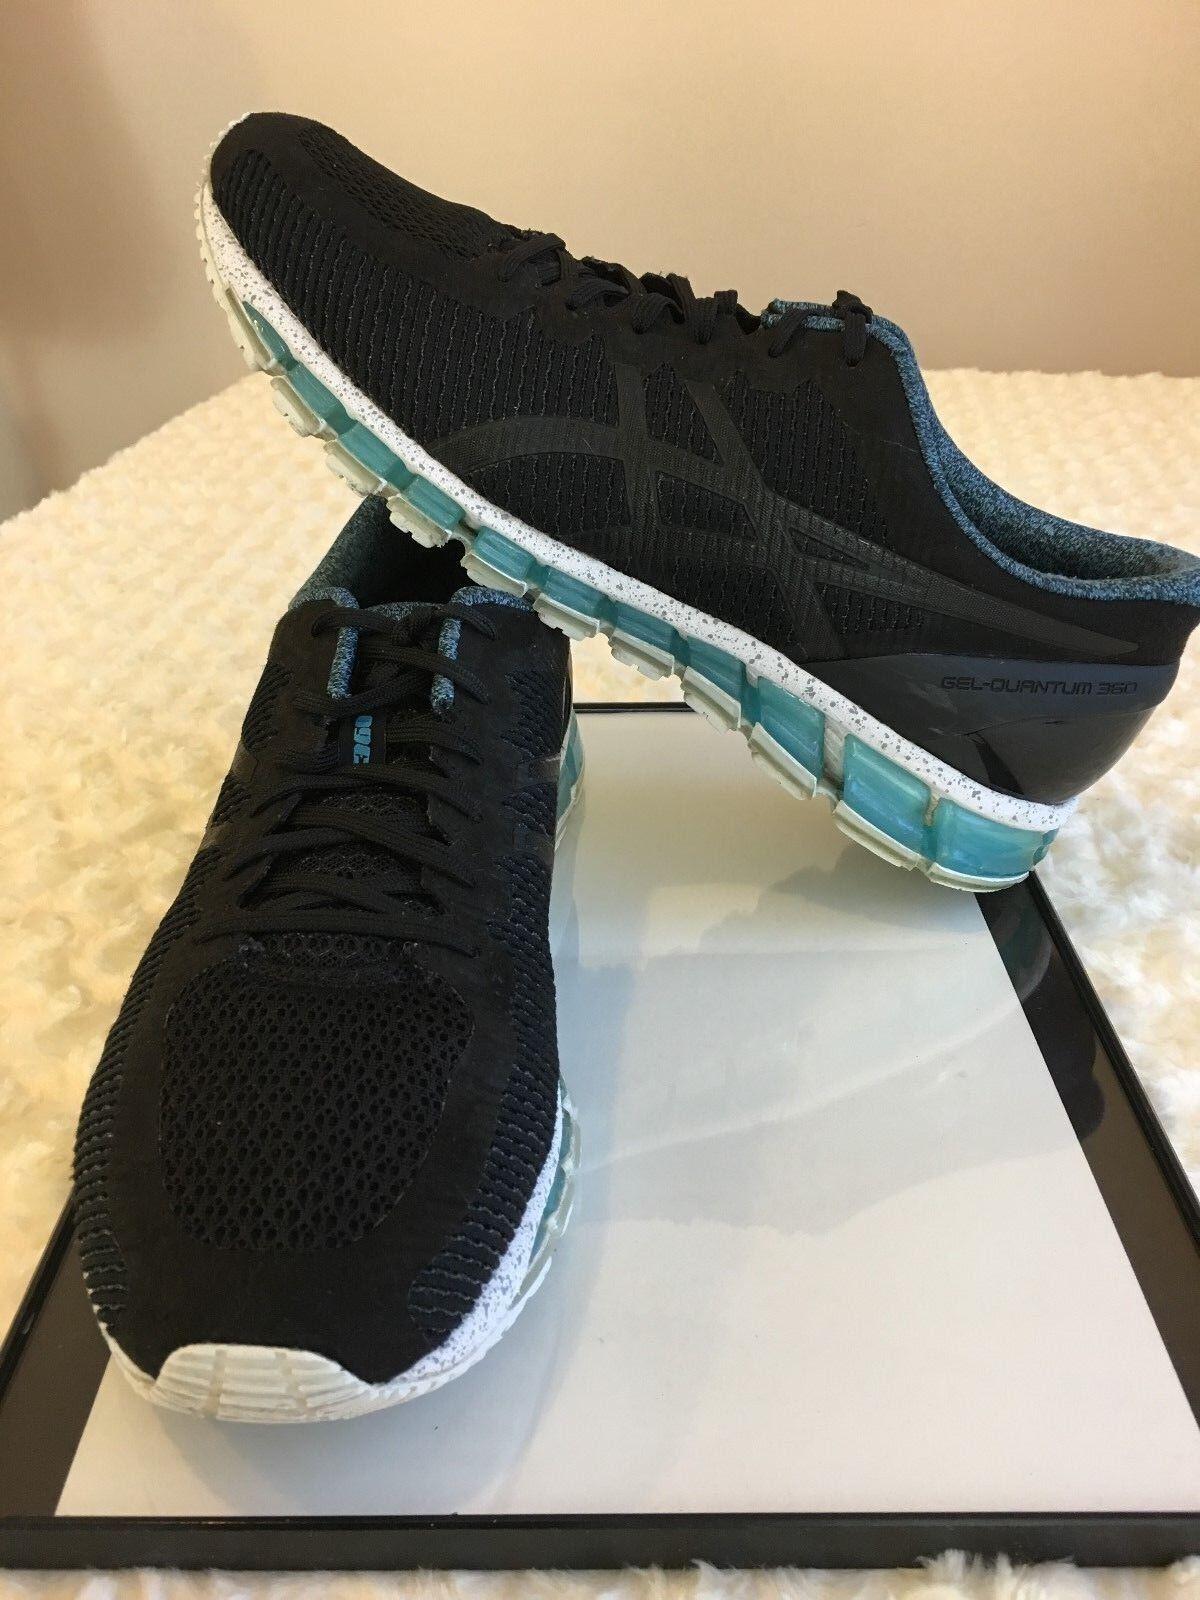 Asic nerowhite gel quantom 360 uomini scarpe l '11,5 nerowhite Asic blu in formazione sportiva 8c649c